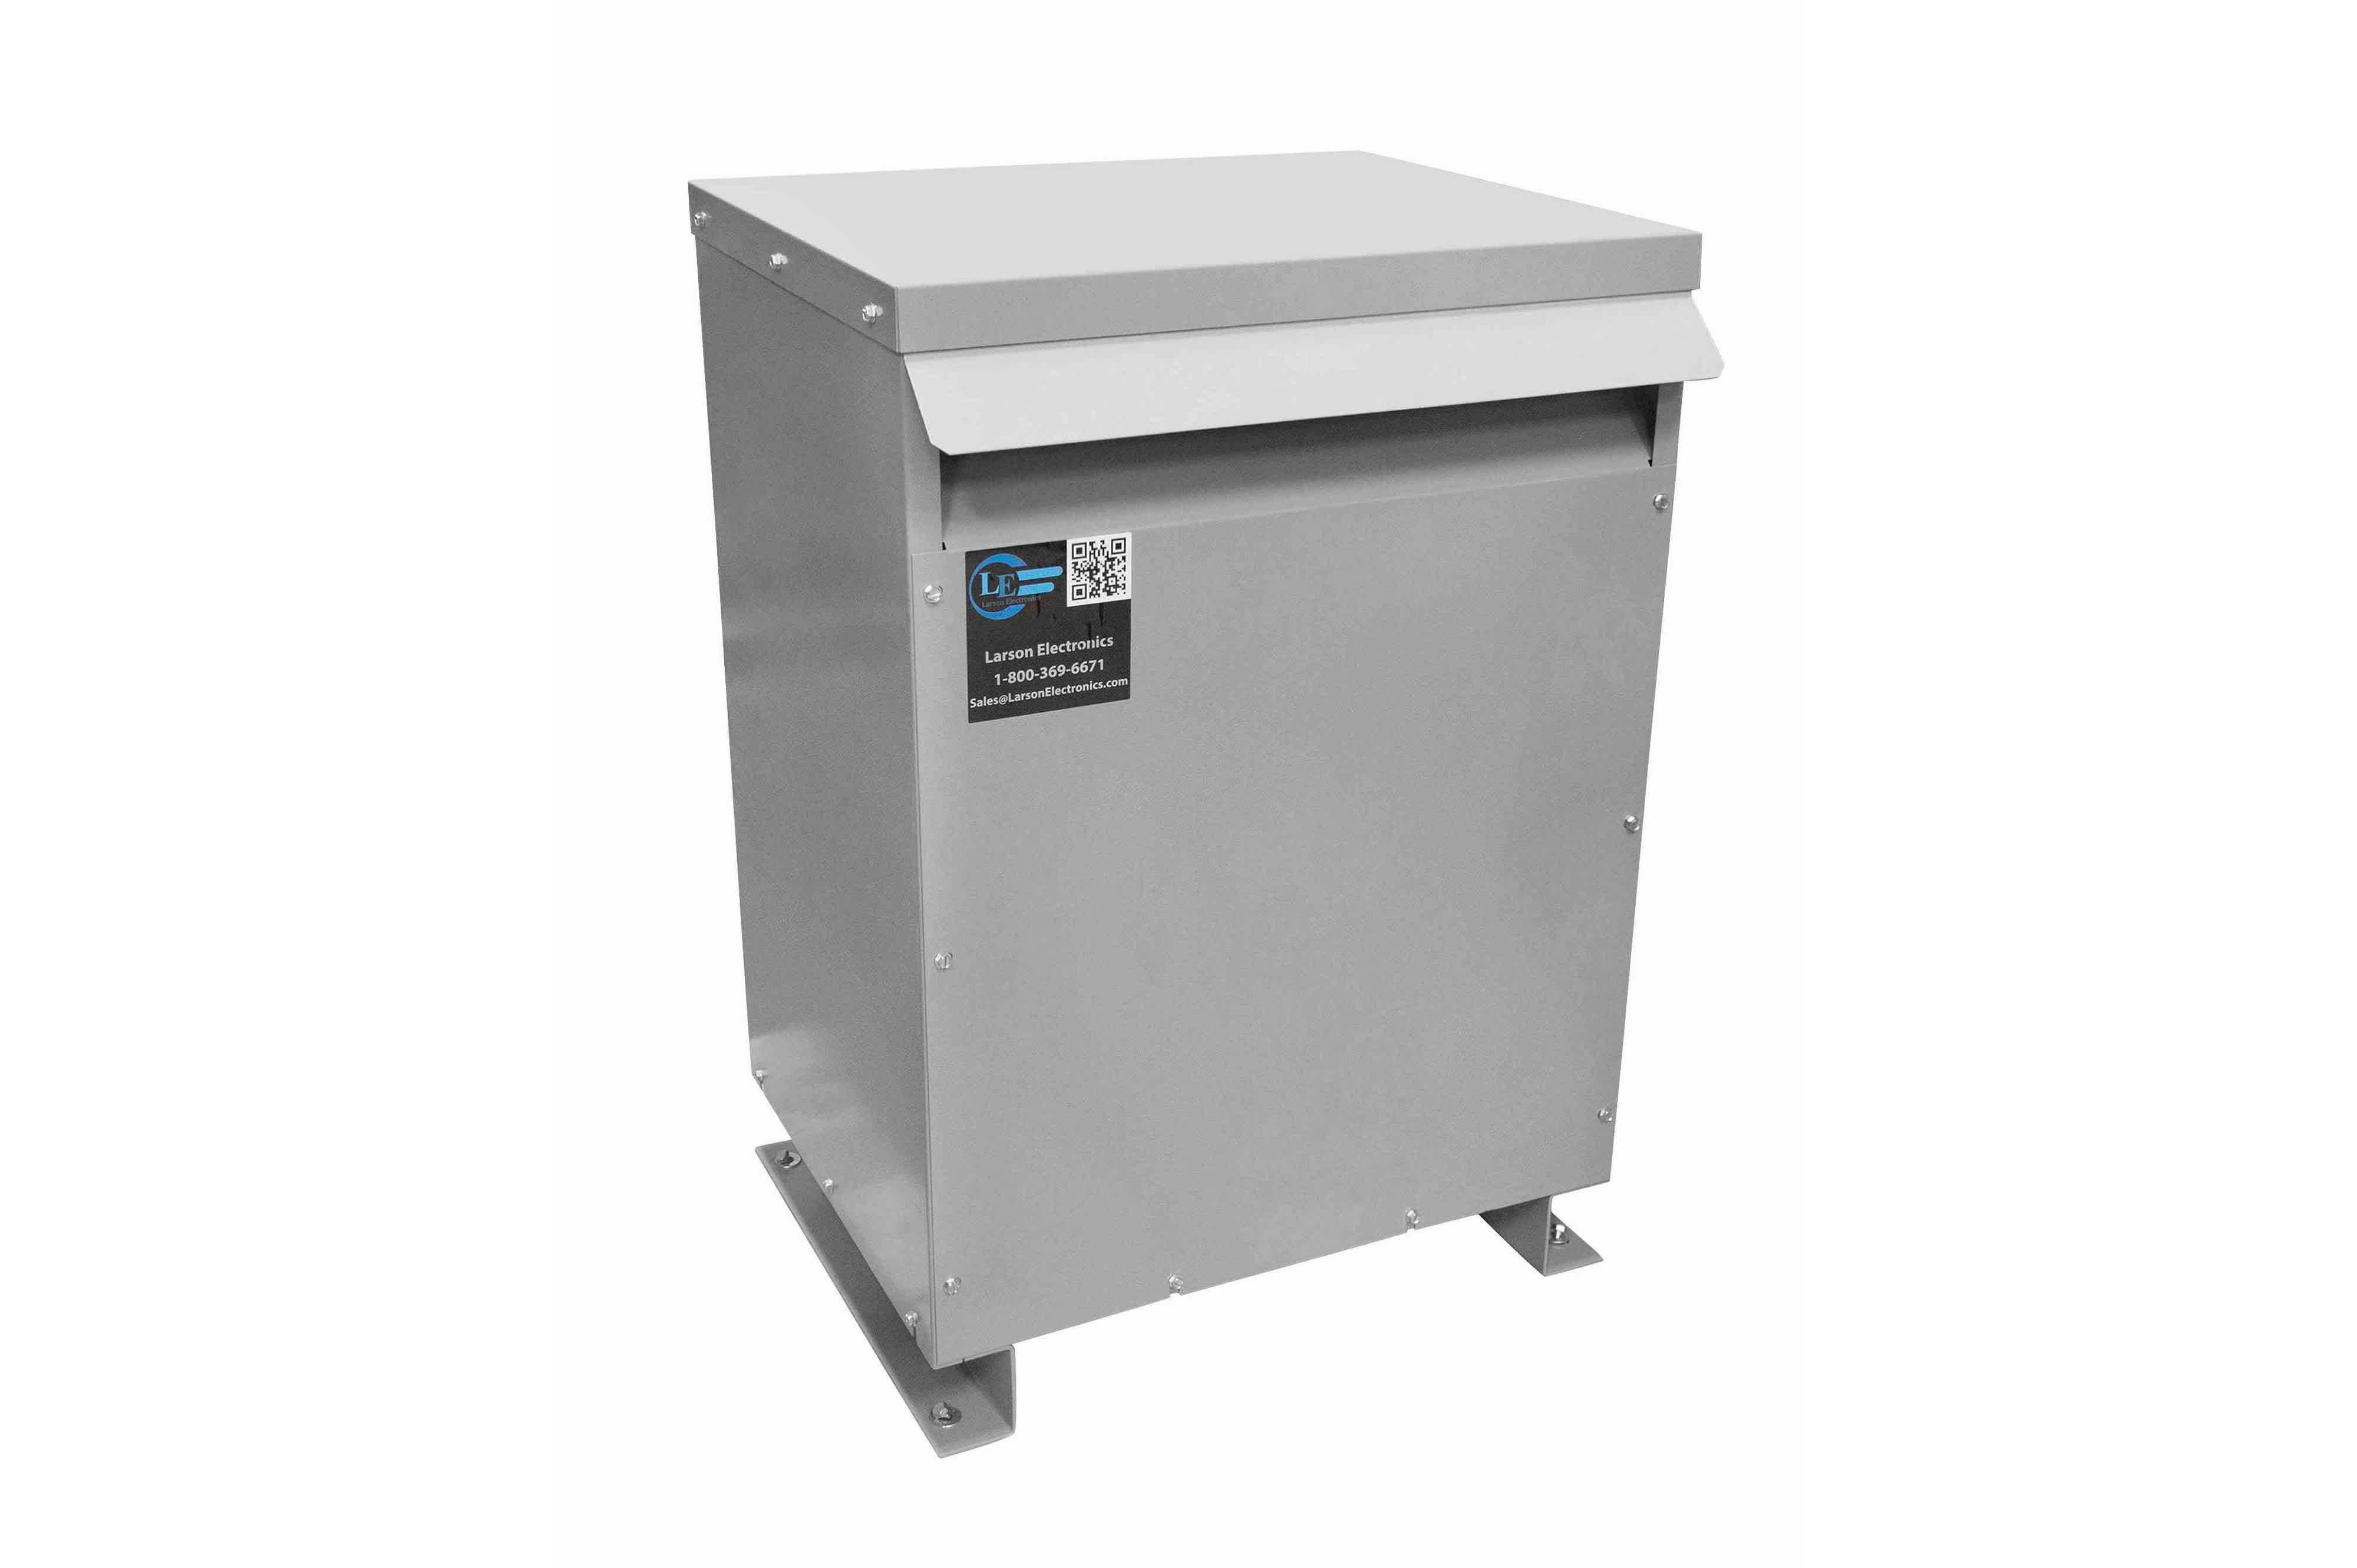 27 kVA 3PH Isolation Transformer, 460V Wye Primary, 380Y/220 Wye-N Secondary, N3R, Ventilated, 60 Hz